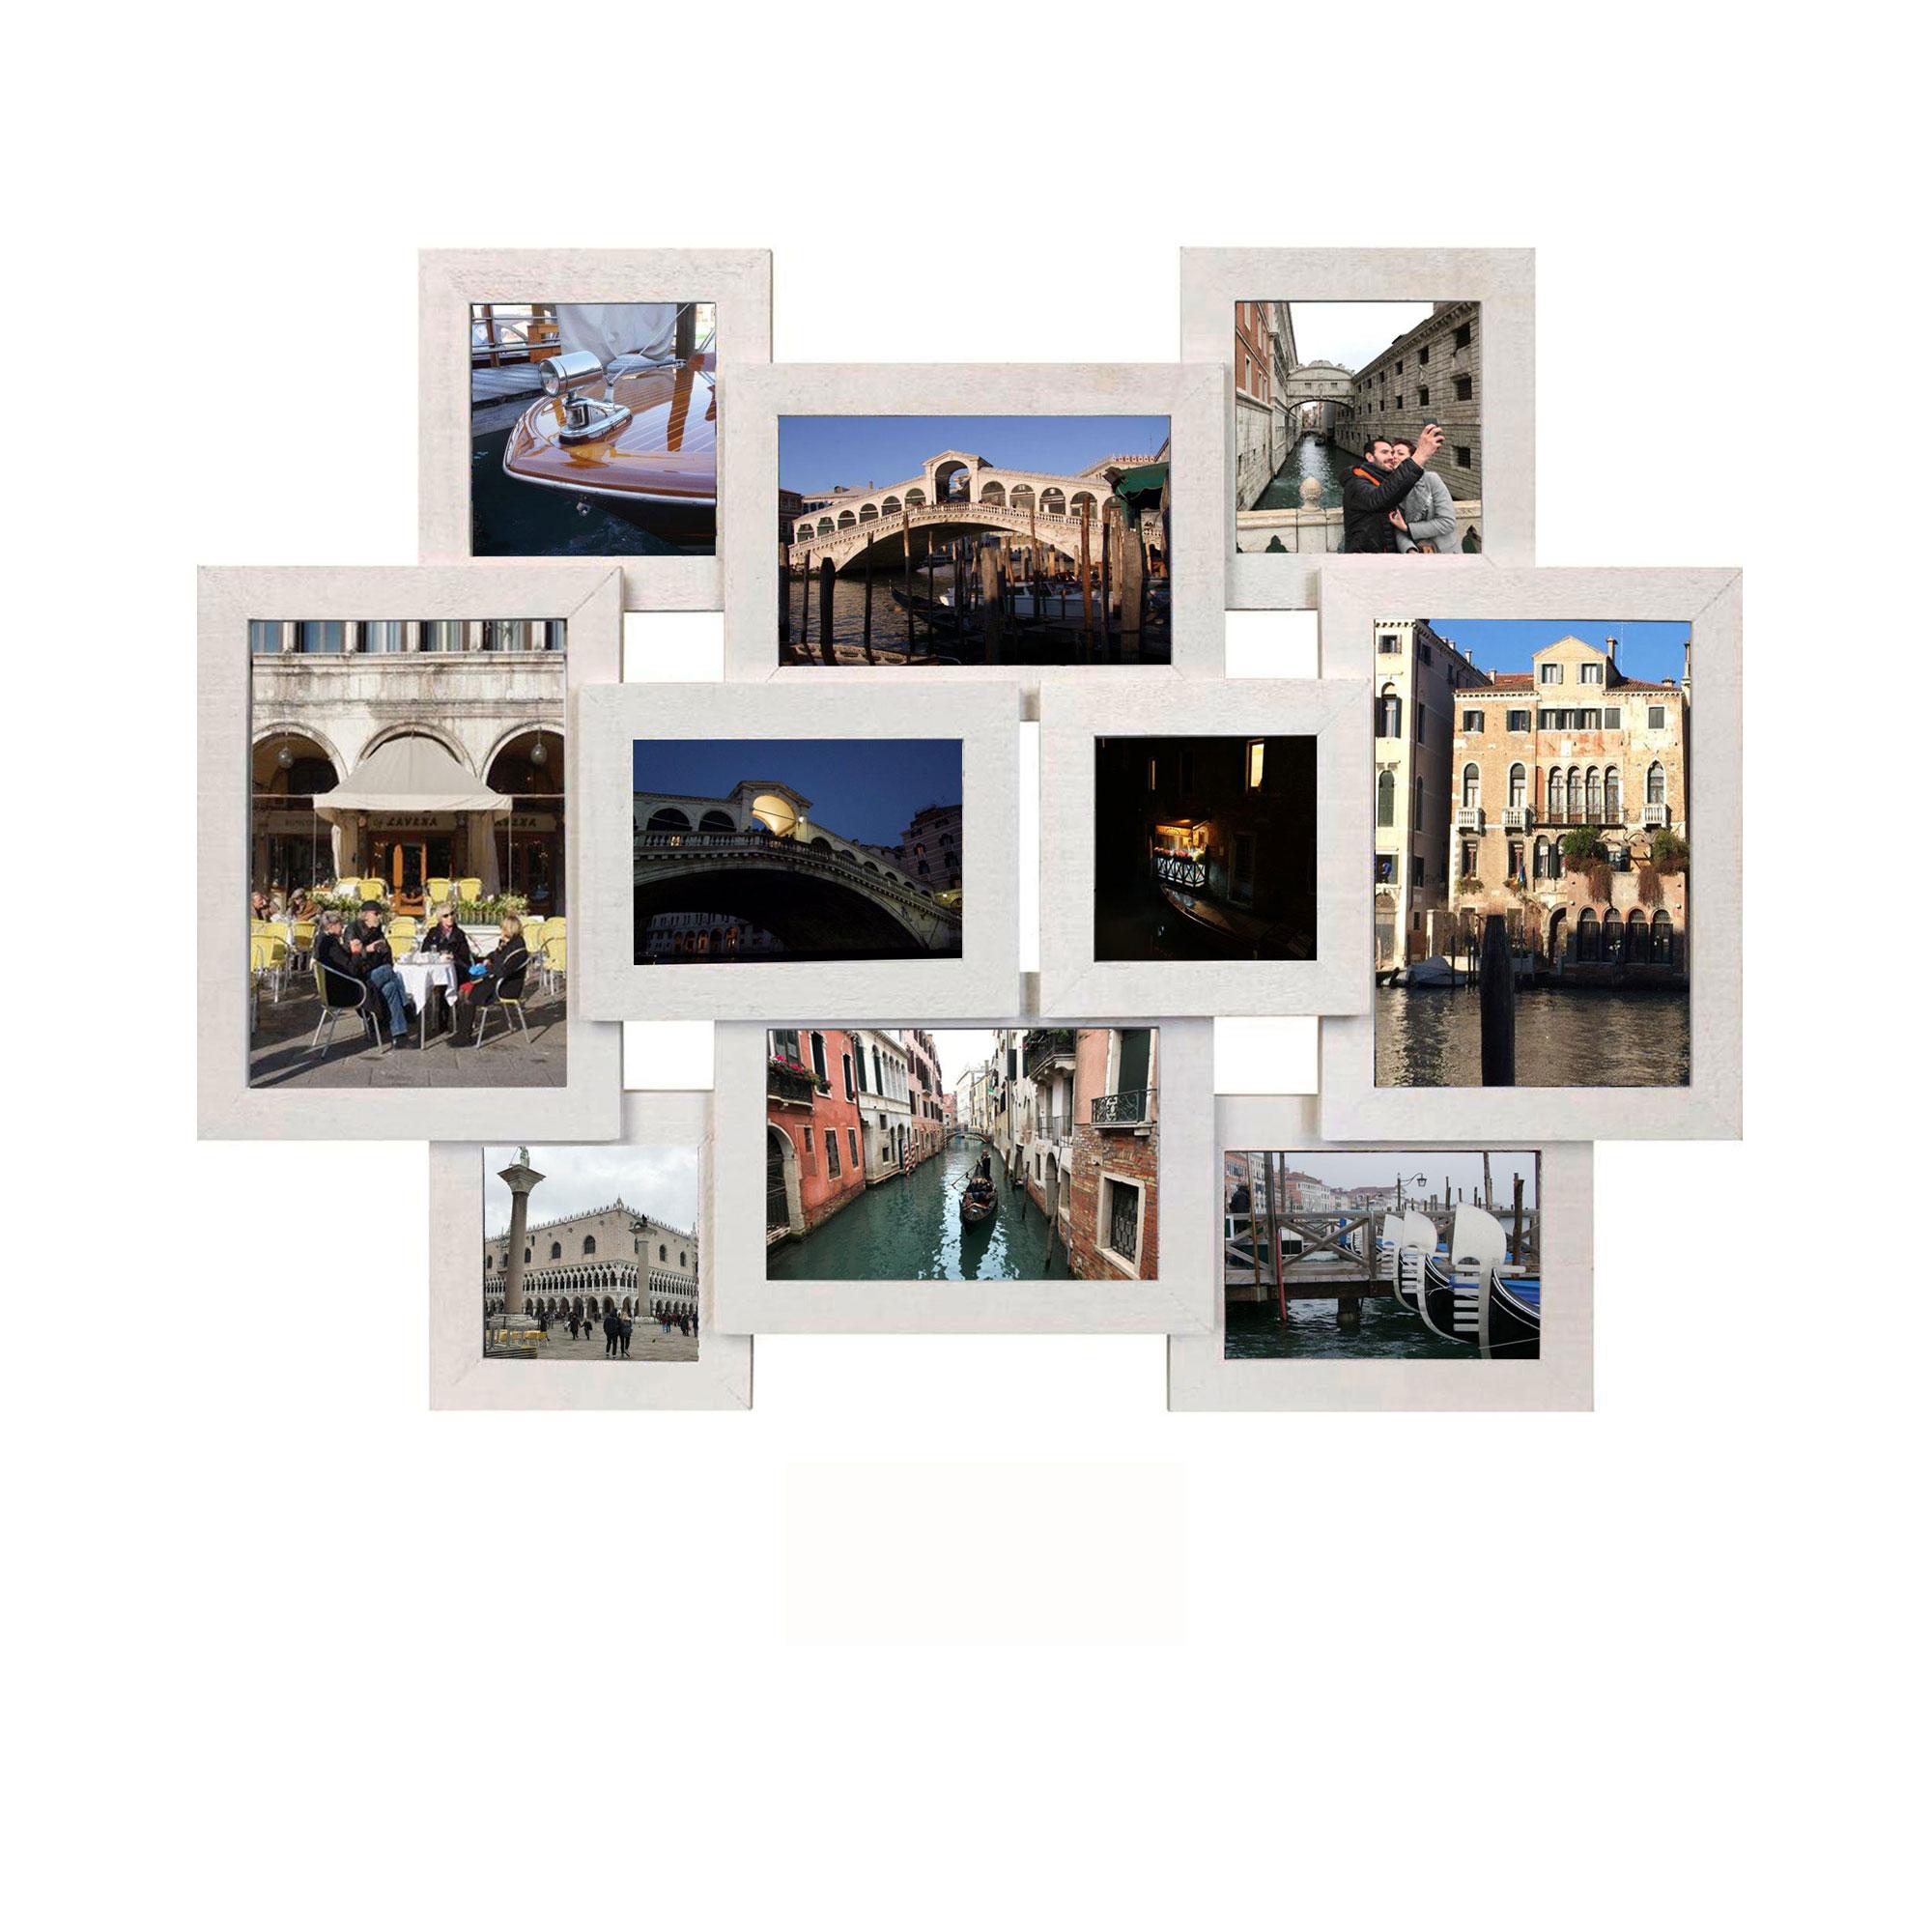 10er collage bilbao wei bilderrahmen holzrahmen mdf rahmen gr e ca 57x43 cm 4033705751478. Black Bedroom Furniture Sets. Home Design Ideas